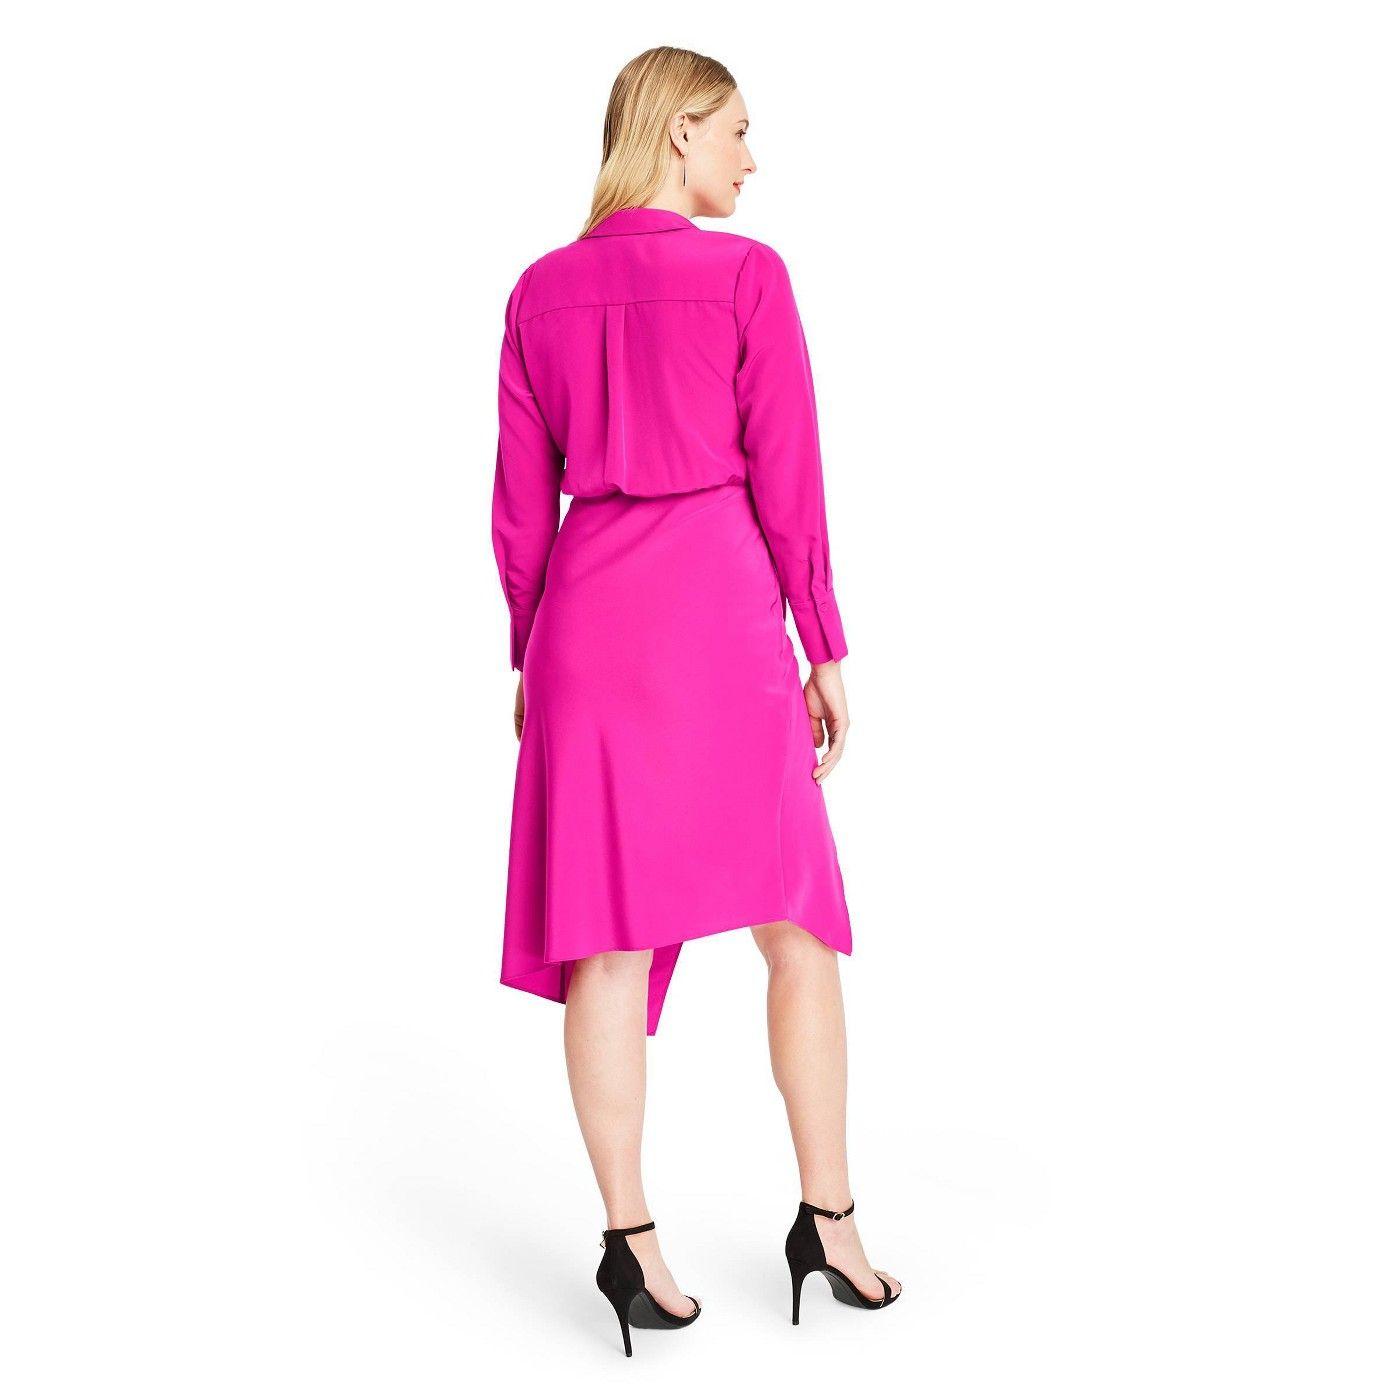 Women S Wrap Shirtdress Cushnie For Target Regular Plus Magenta Pink Sponsored Shirtdress Sponsored Cushnie Women Vintage Style Outfits Outfit 90s [ 1400 x 1400 Pixel ]